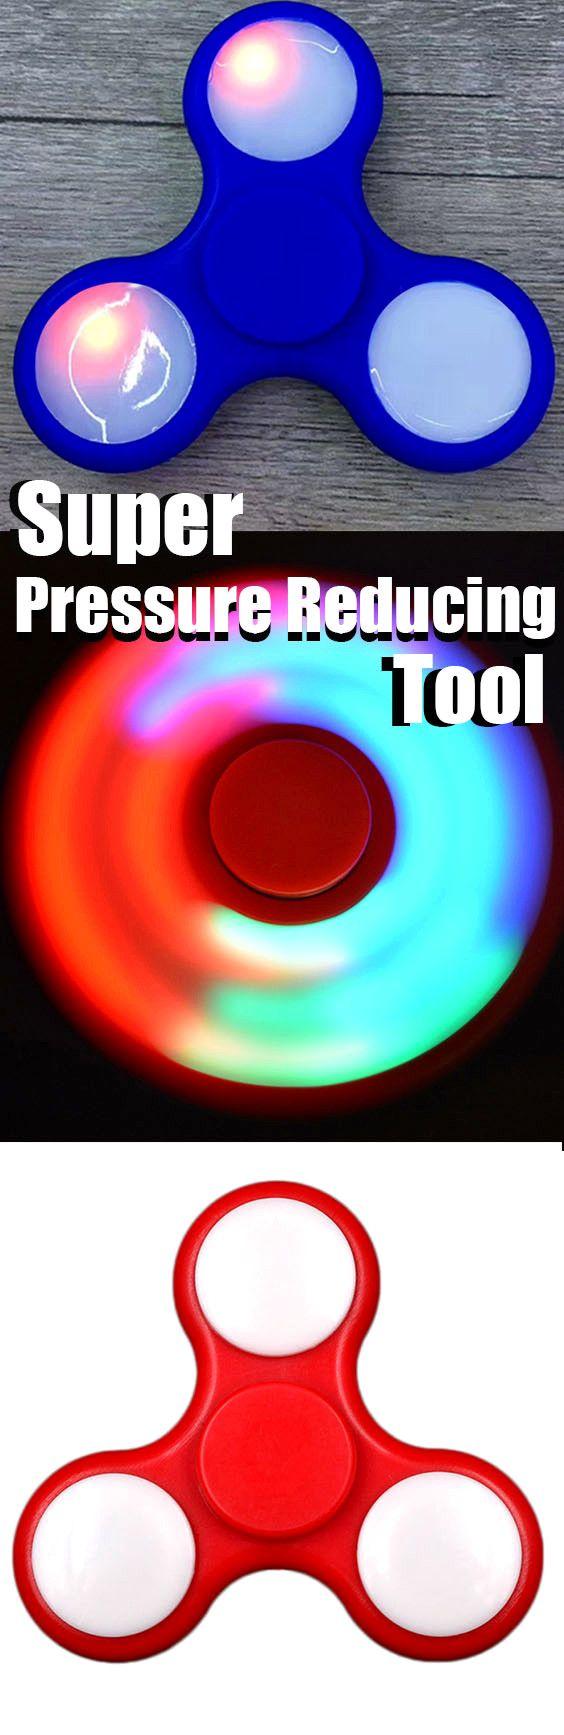 Super Pressure Reducing Tool